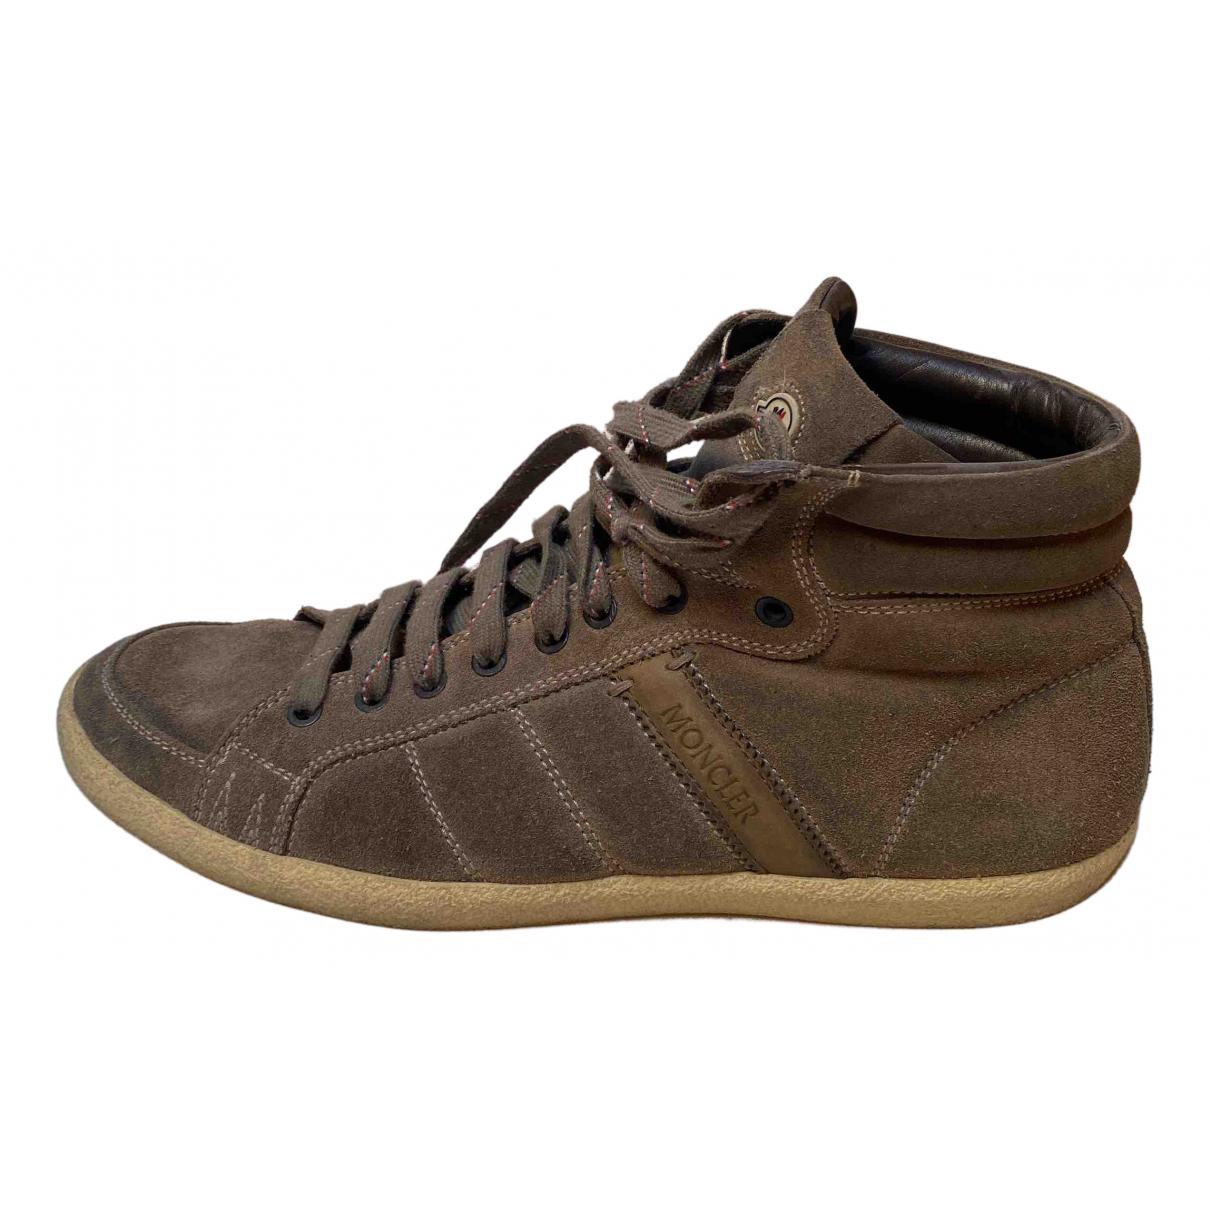 Moncler N Green Suede Boots for Men 44 EU